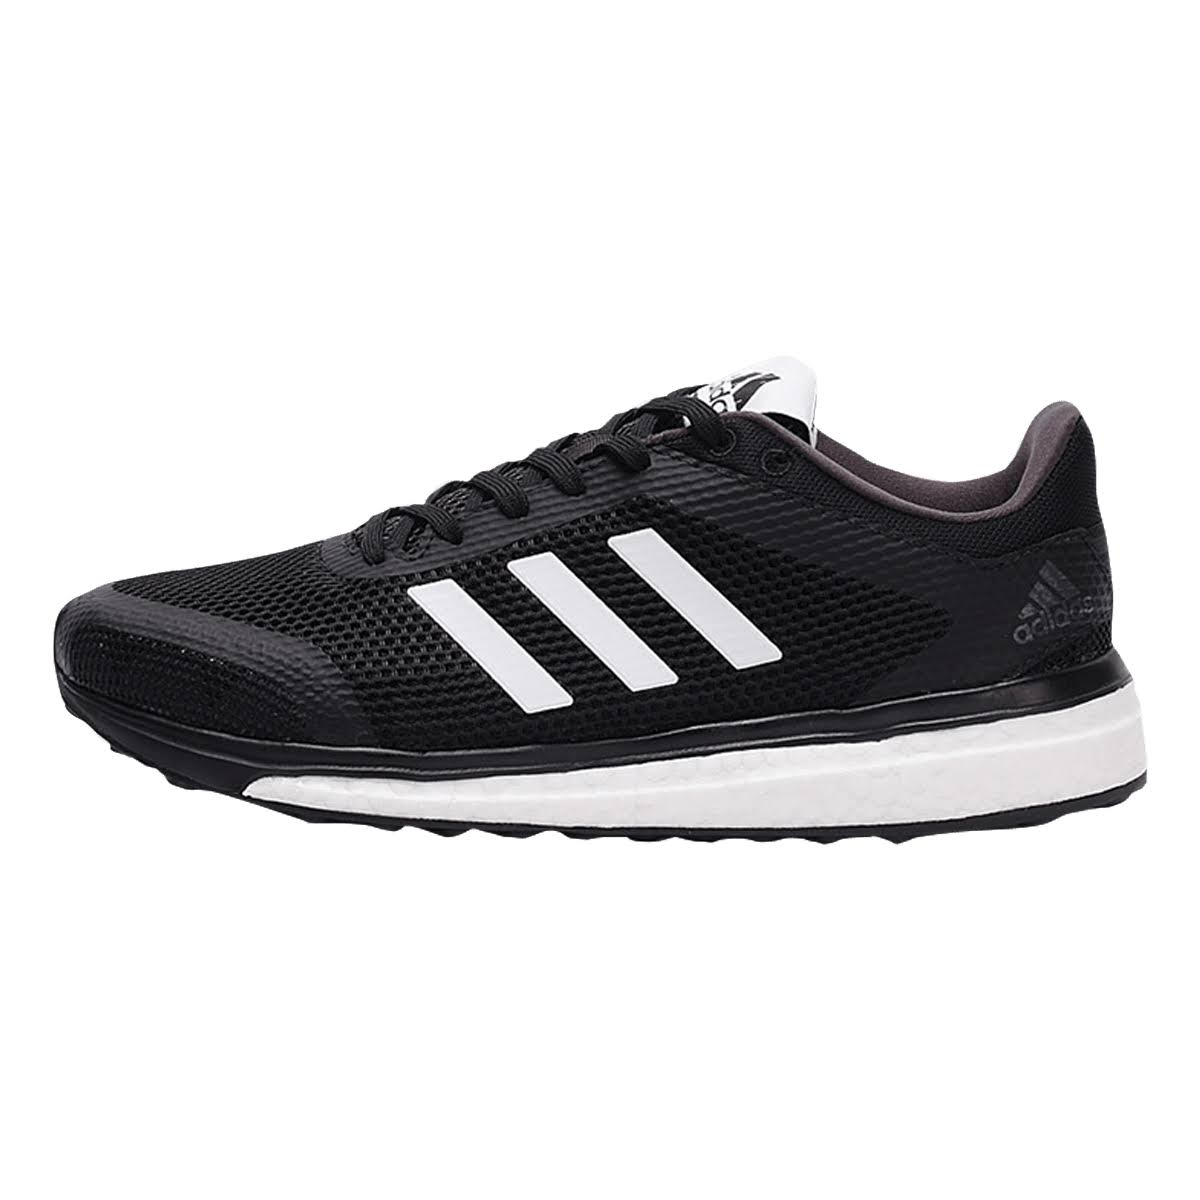 Response amp; Erkek Ayakkabısı M Bb2982 Adidas Antrenman Koşu qaHxEaX8